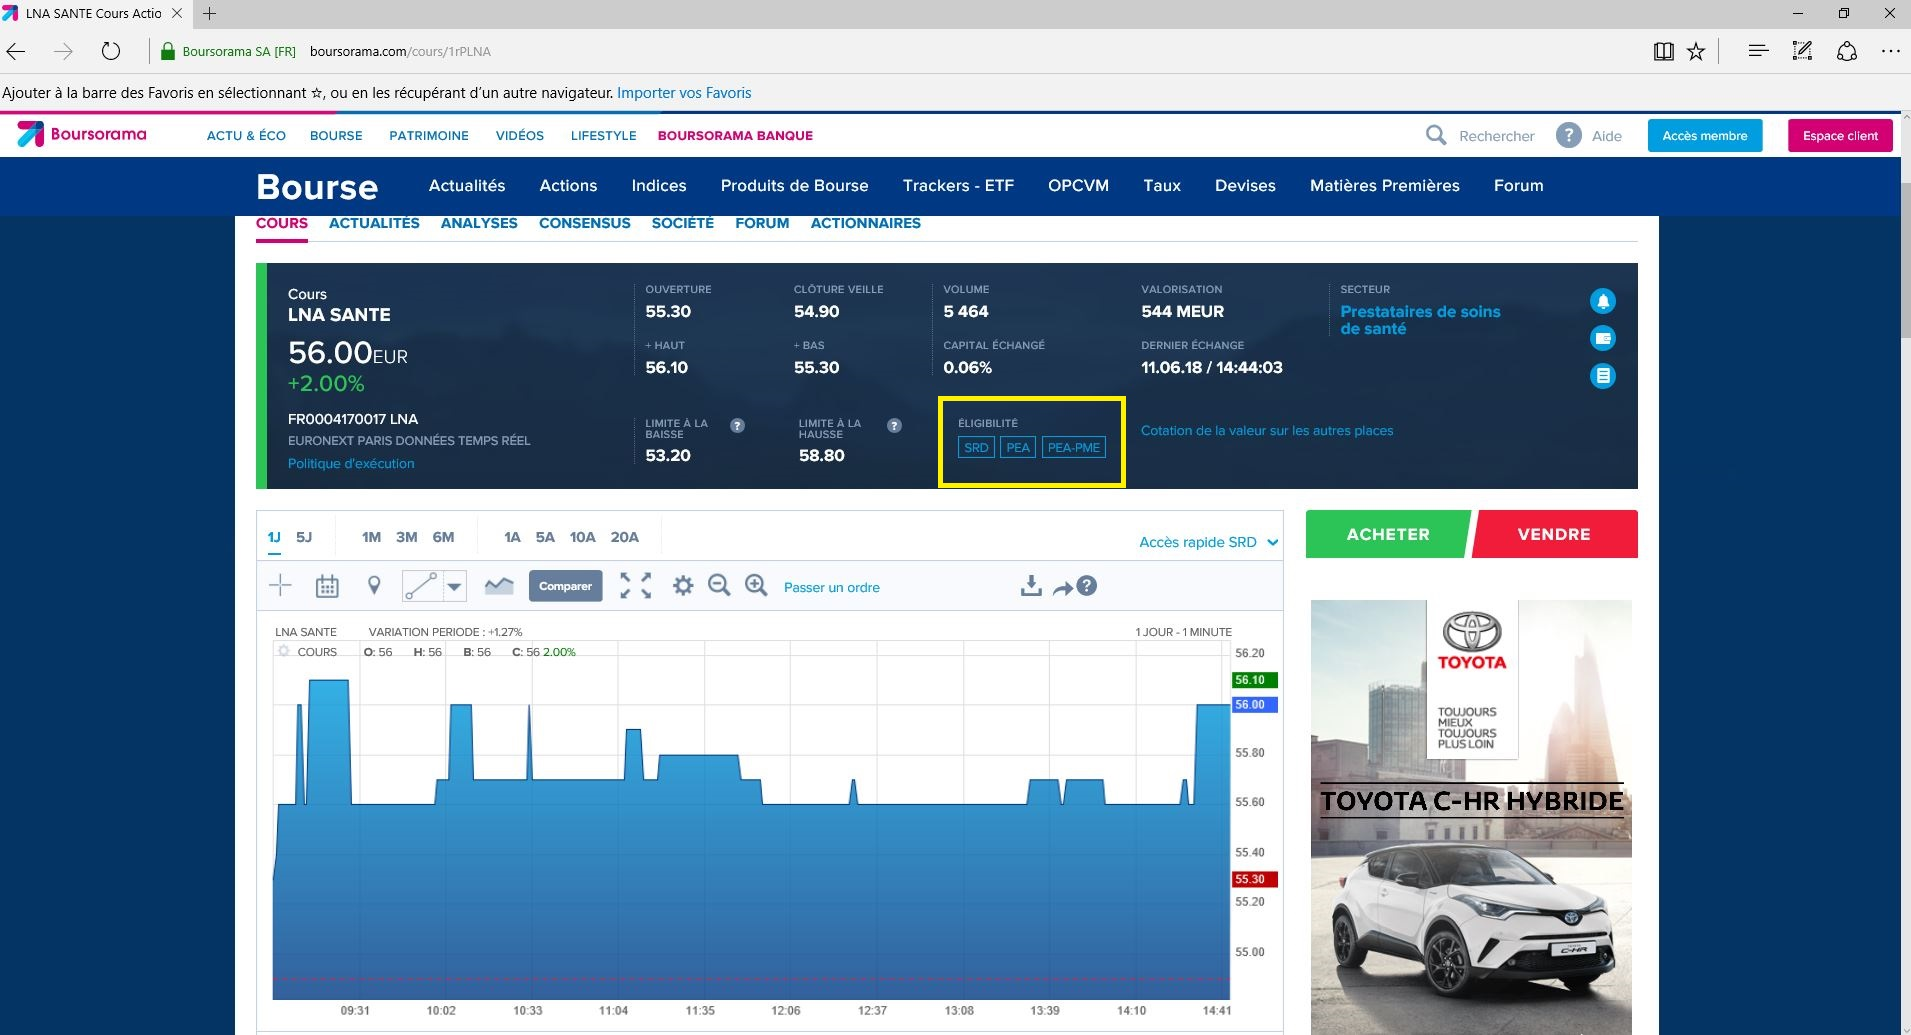 broker ouvrir un compte tutoriel bourse trading